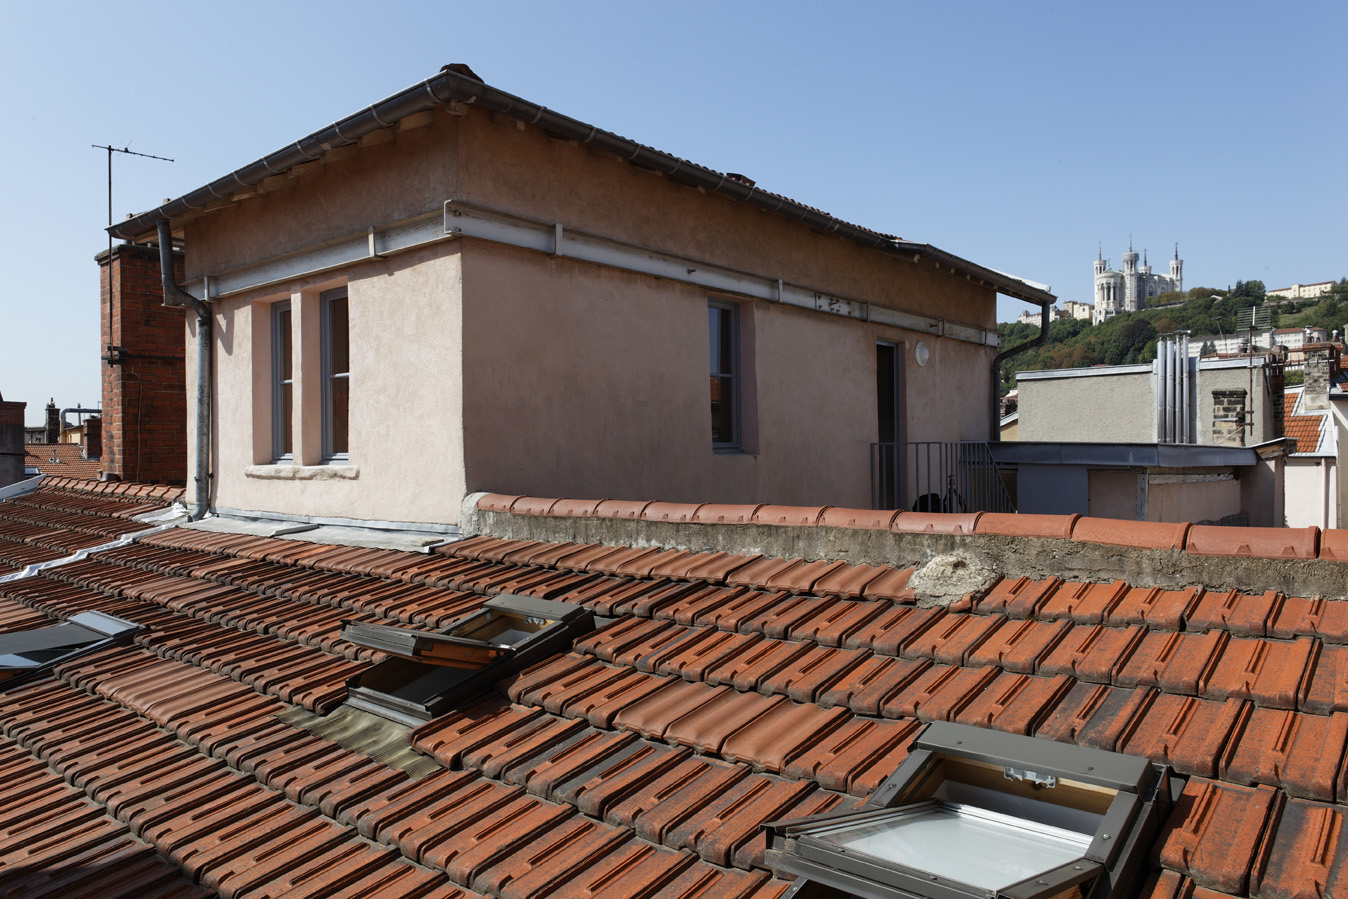 Chambre d h tes lyon avec enfants les toits de lyon for Chambre d hotes lyon